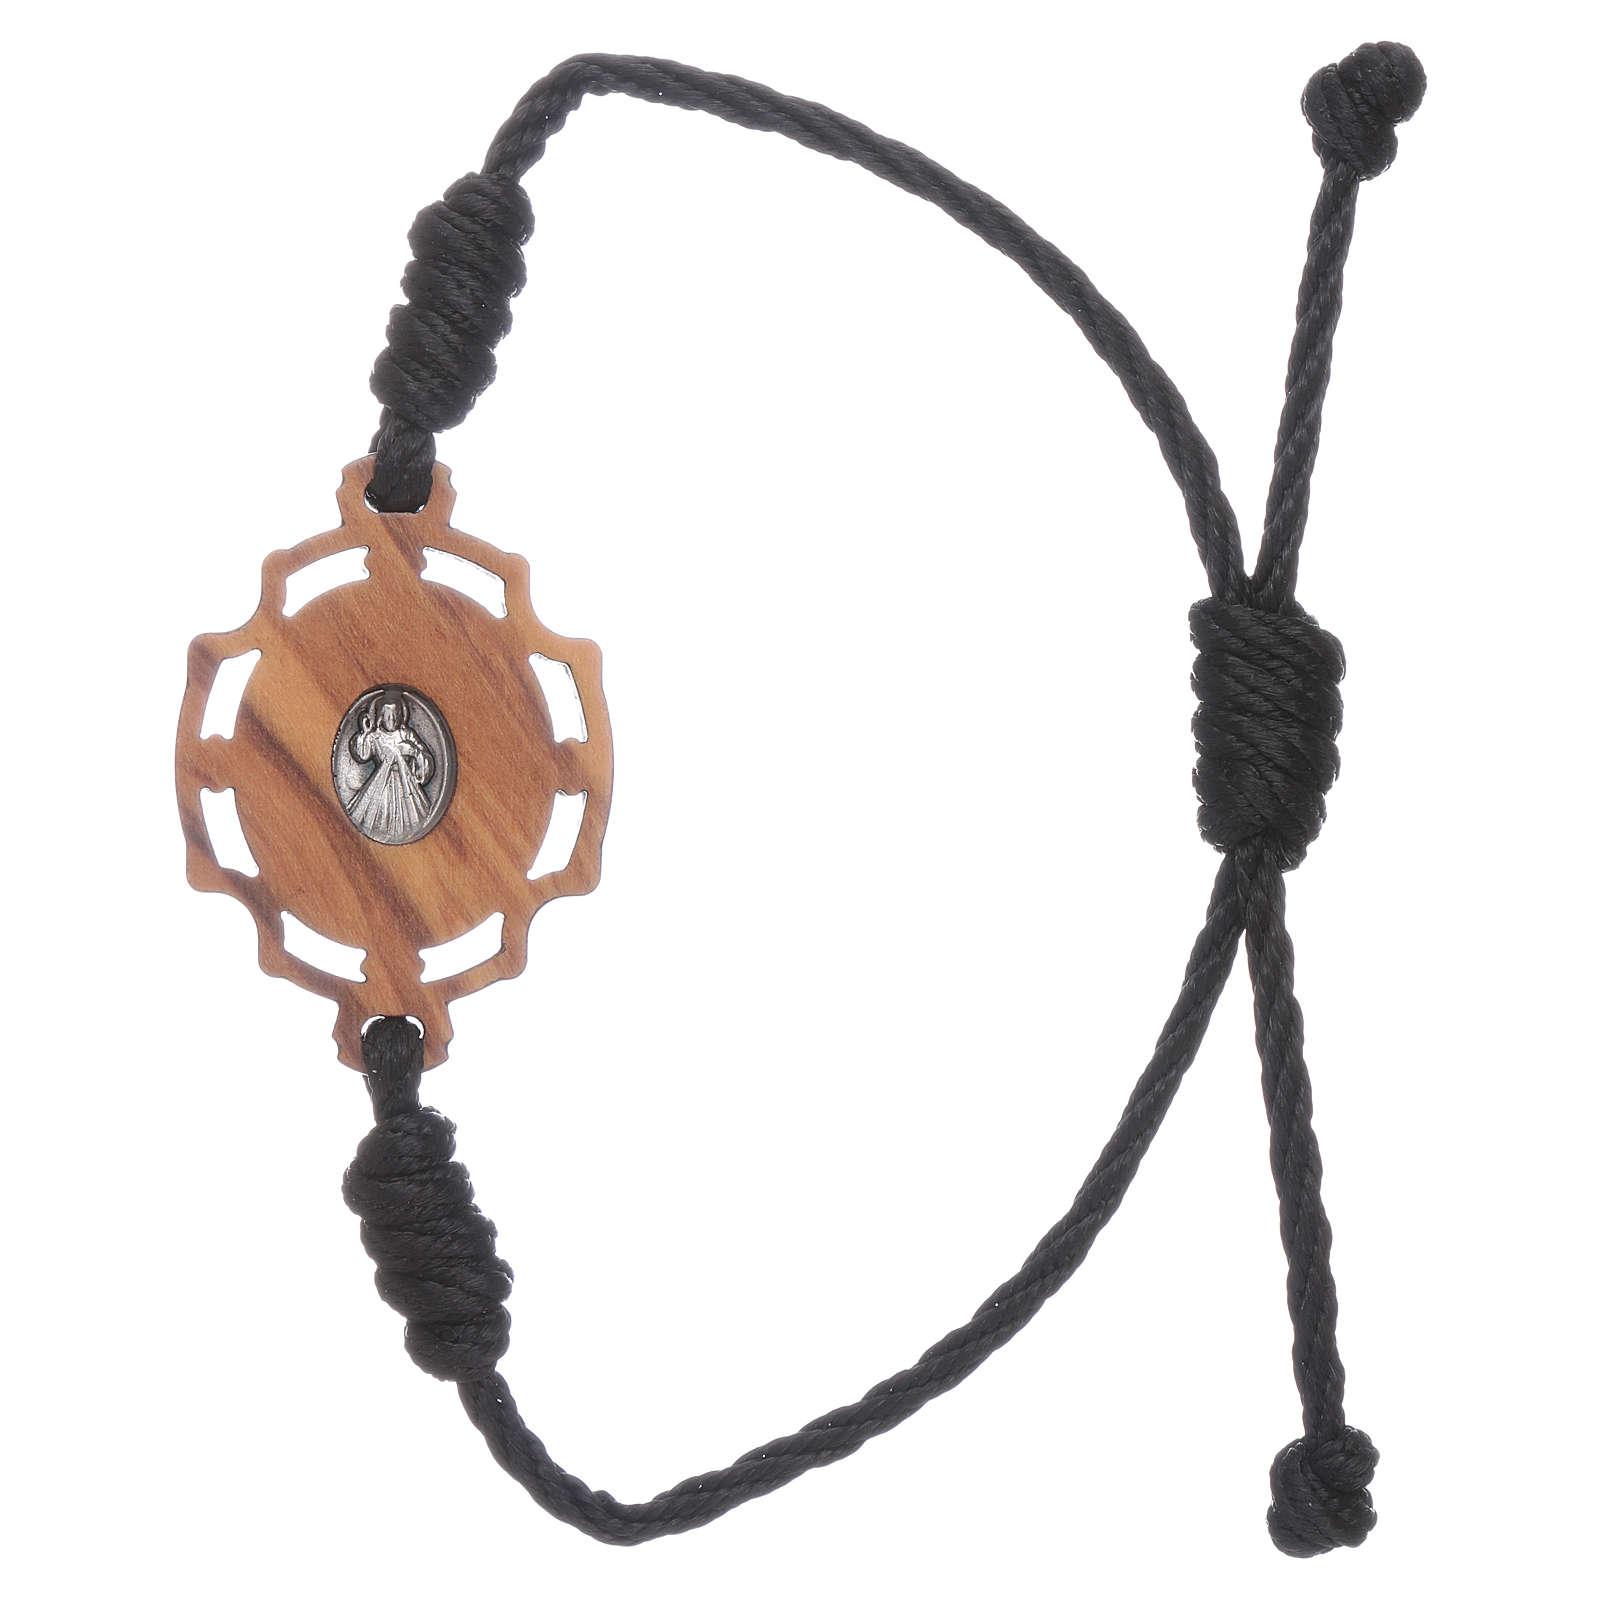 Pulsera Medjuorje imagen Gospa de olivo y cuerda negra 4